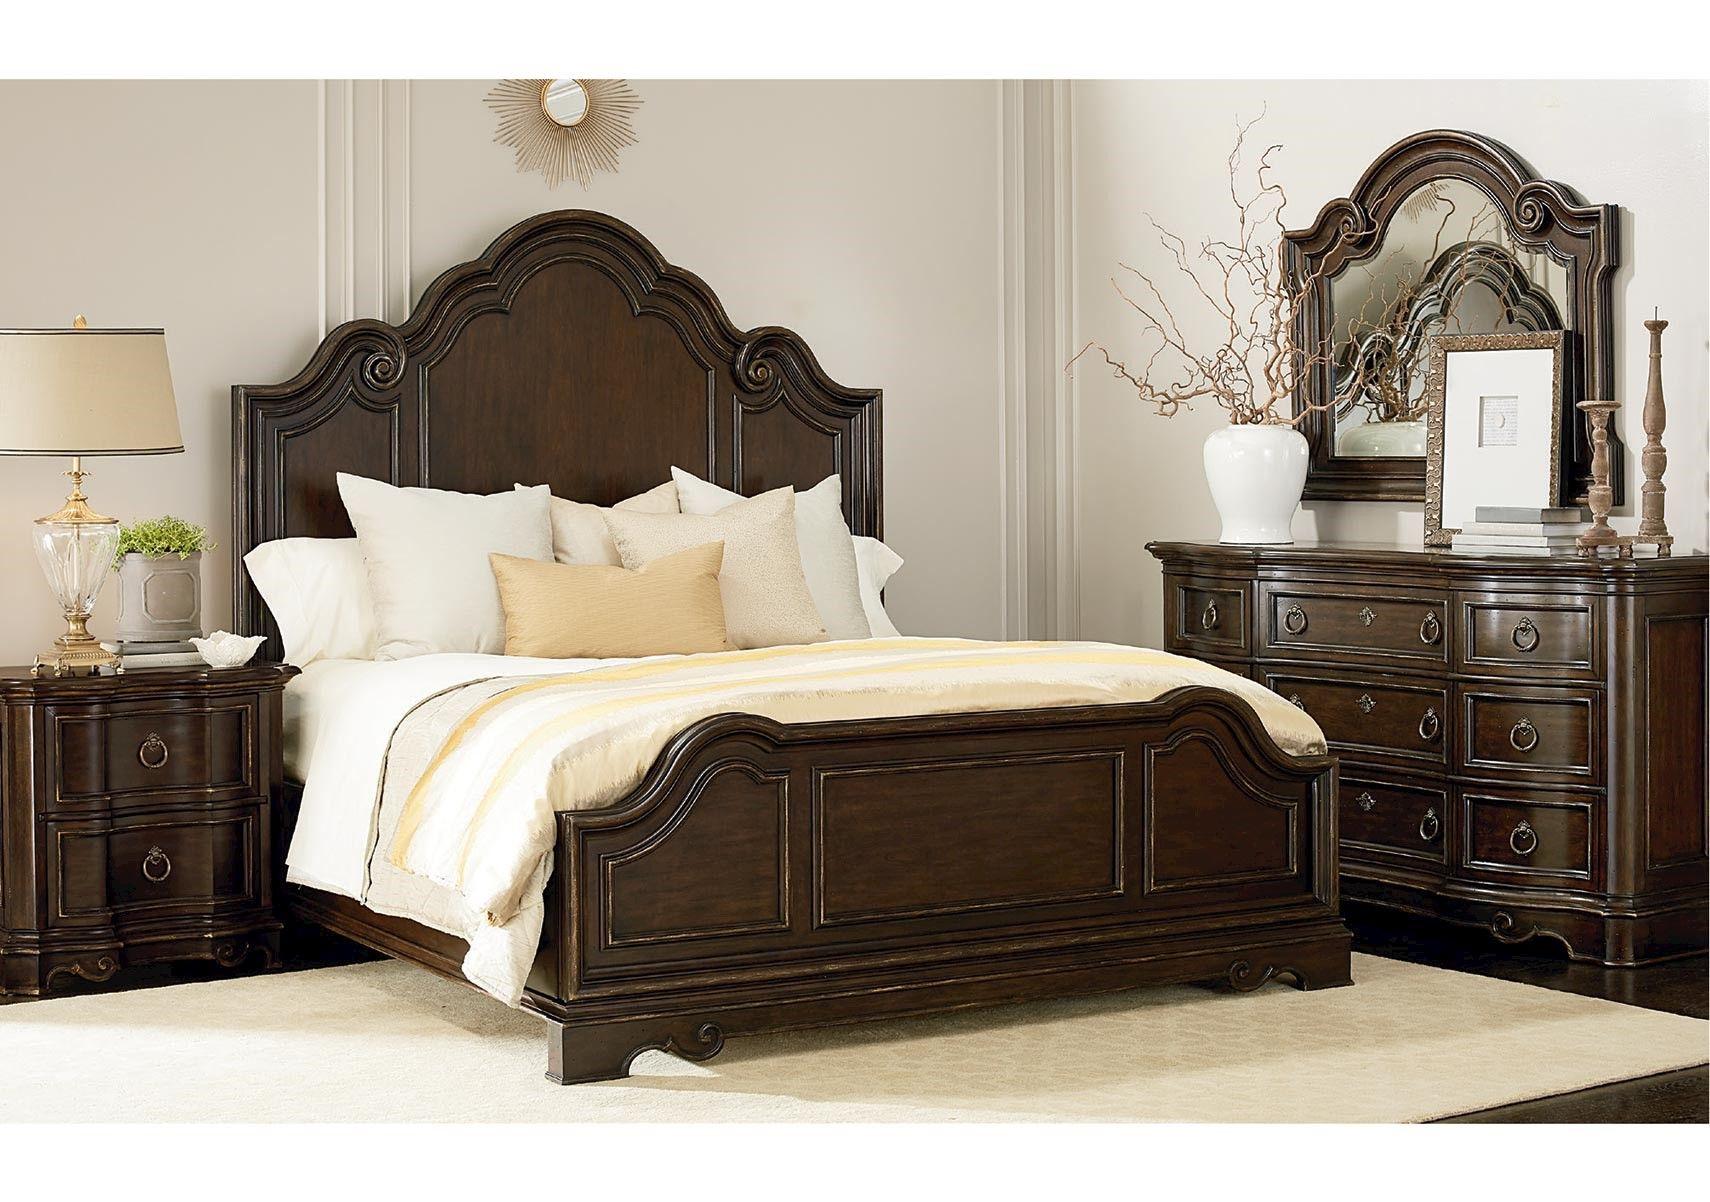 Lacks | Bella 4-Pc Queen Bedroom Set | King bedroom sets ...